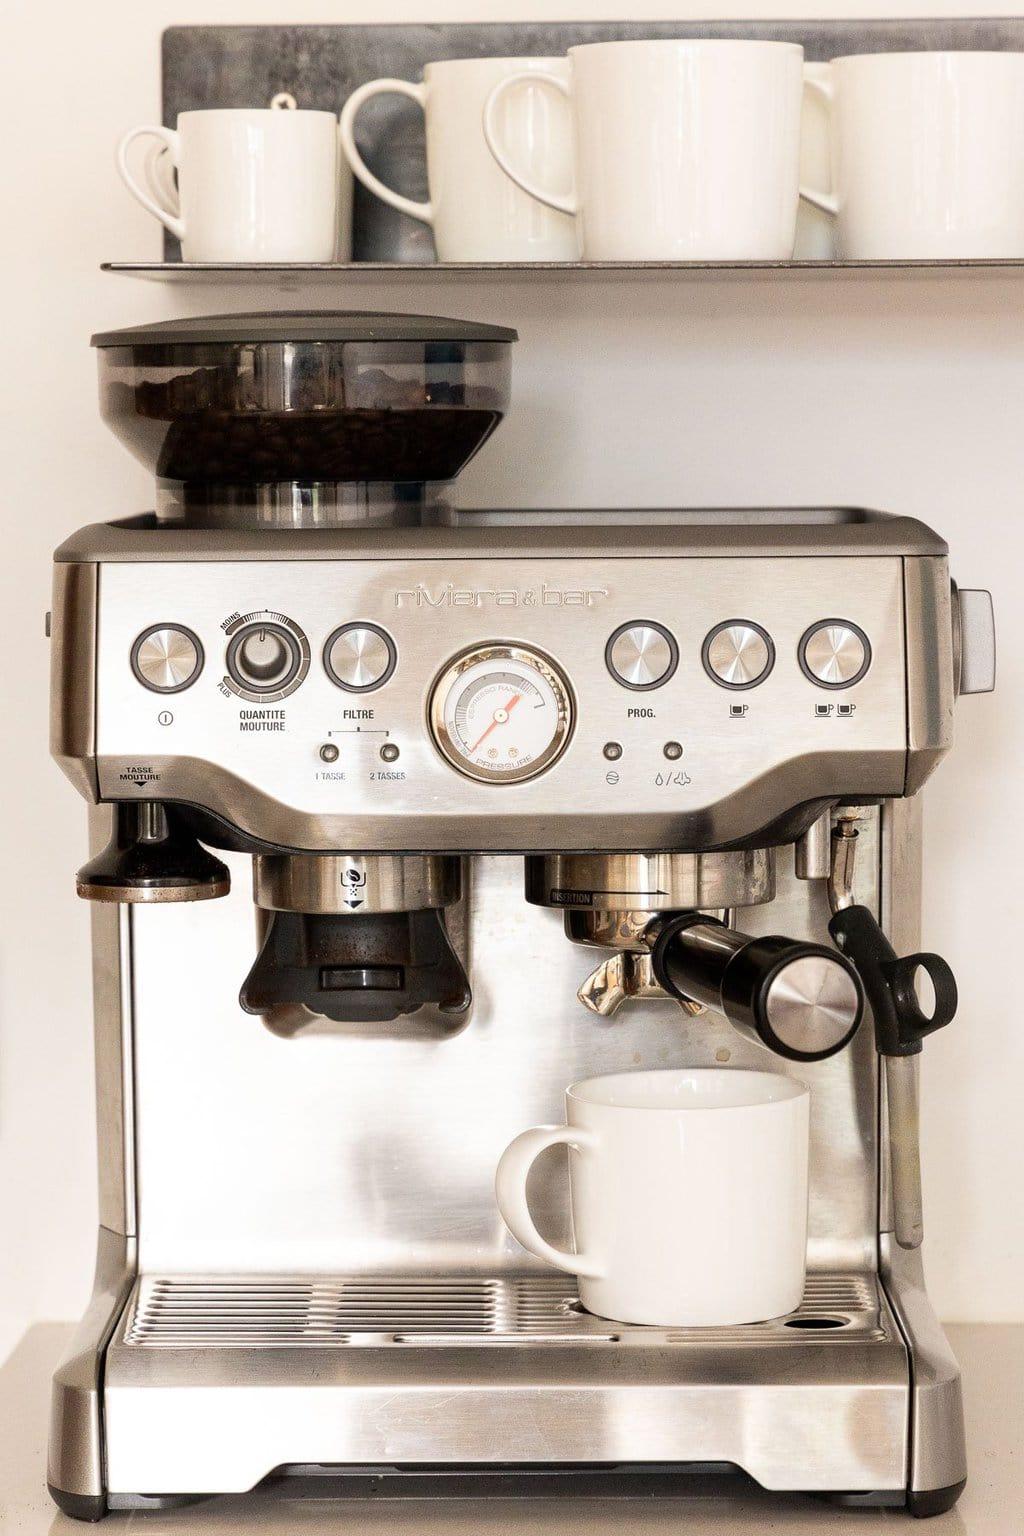 Vertical closeup photo of the espresso machine in our condo in Argentière, France.